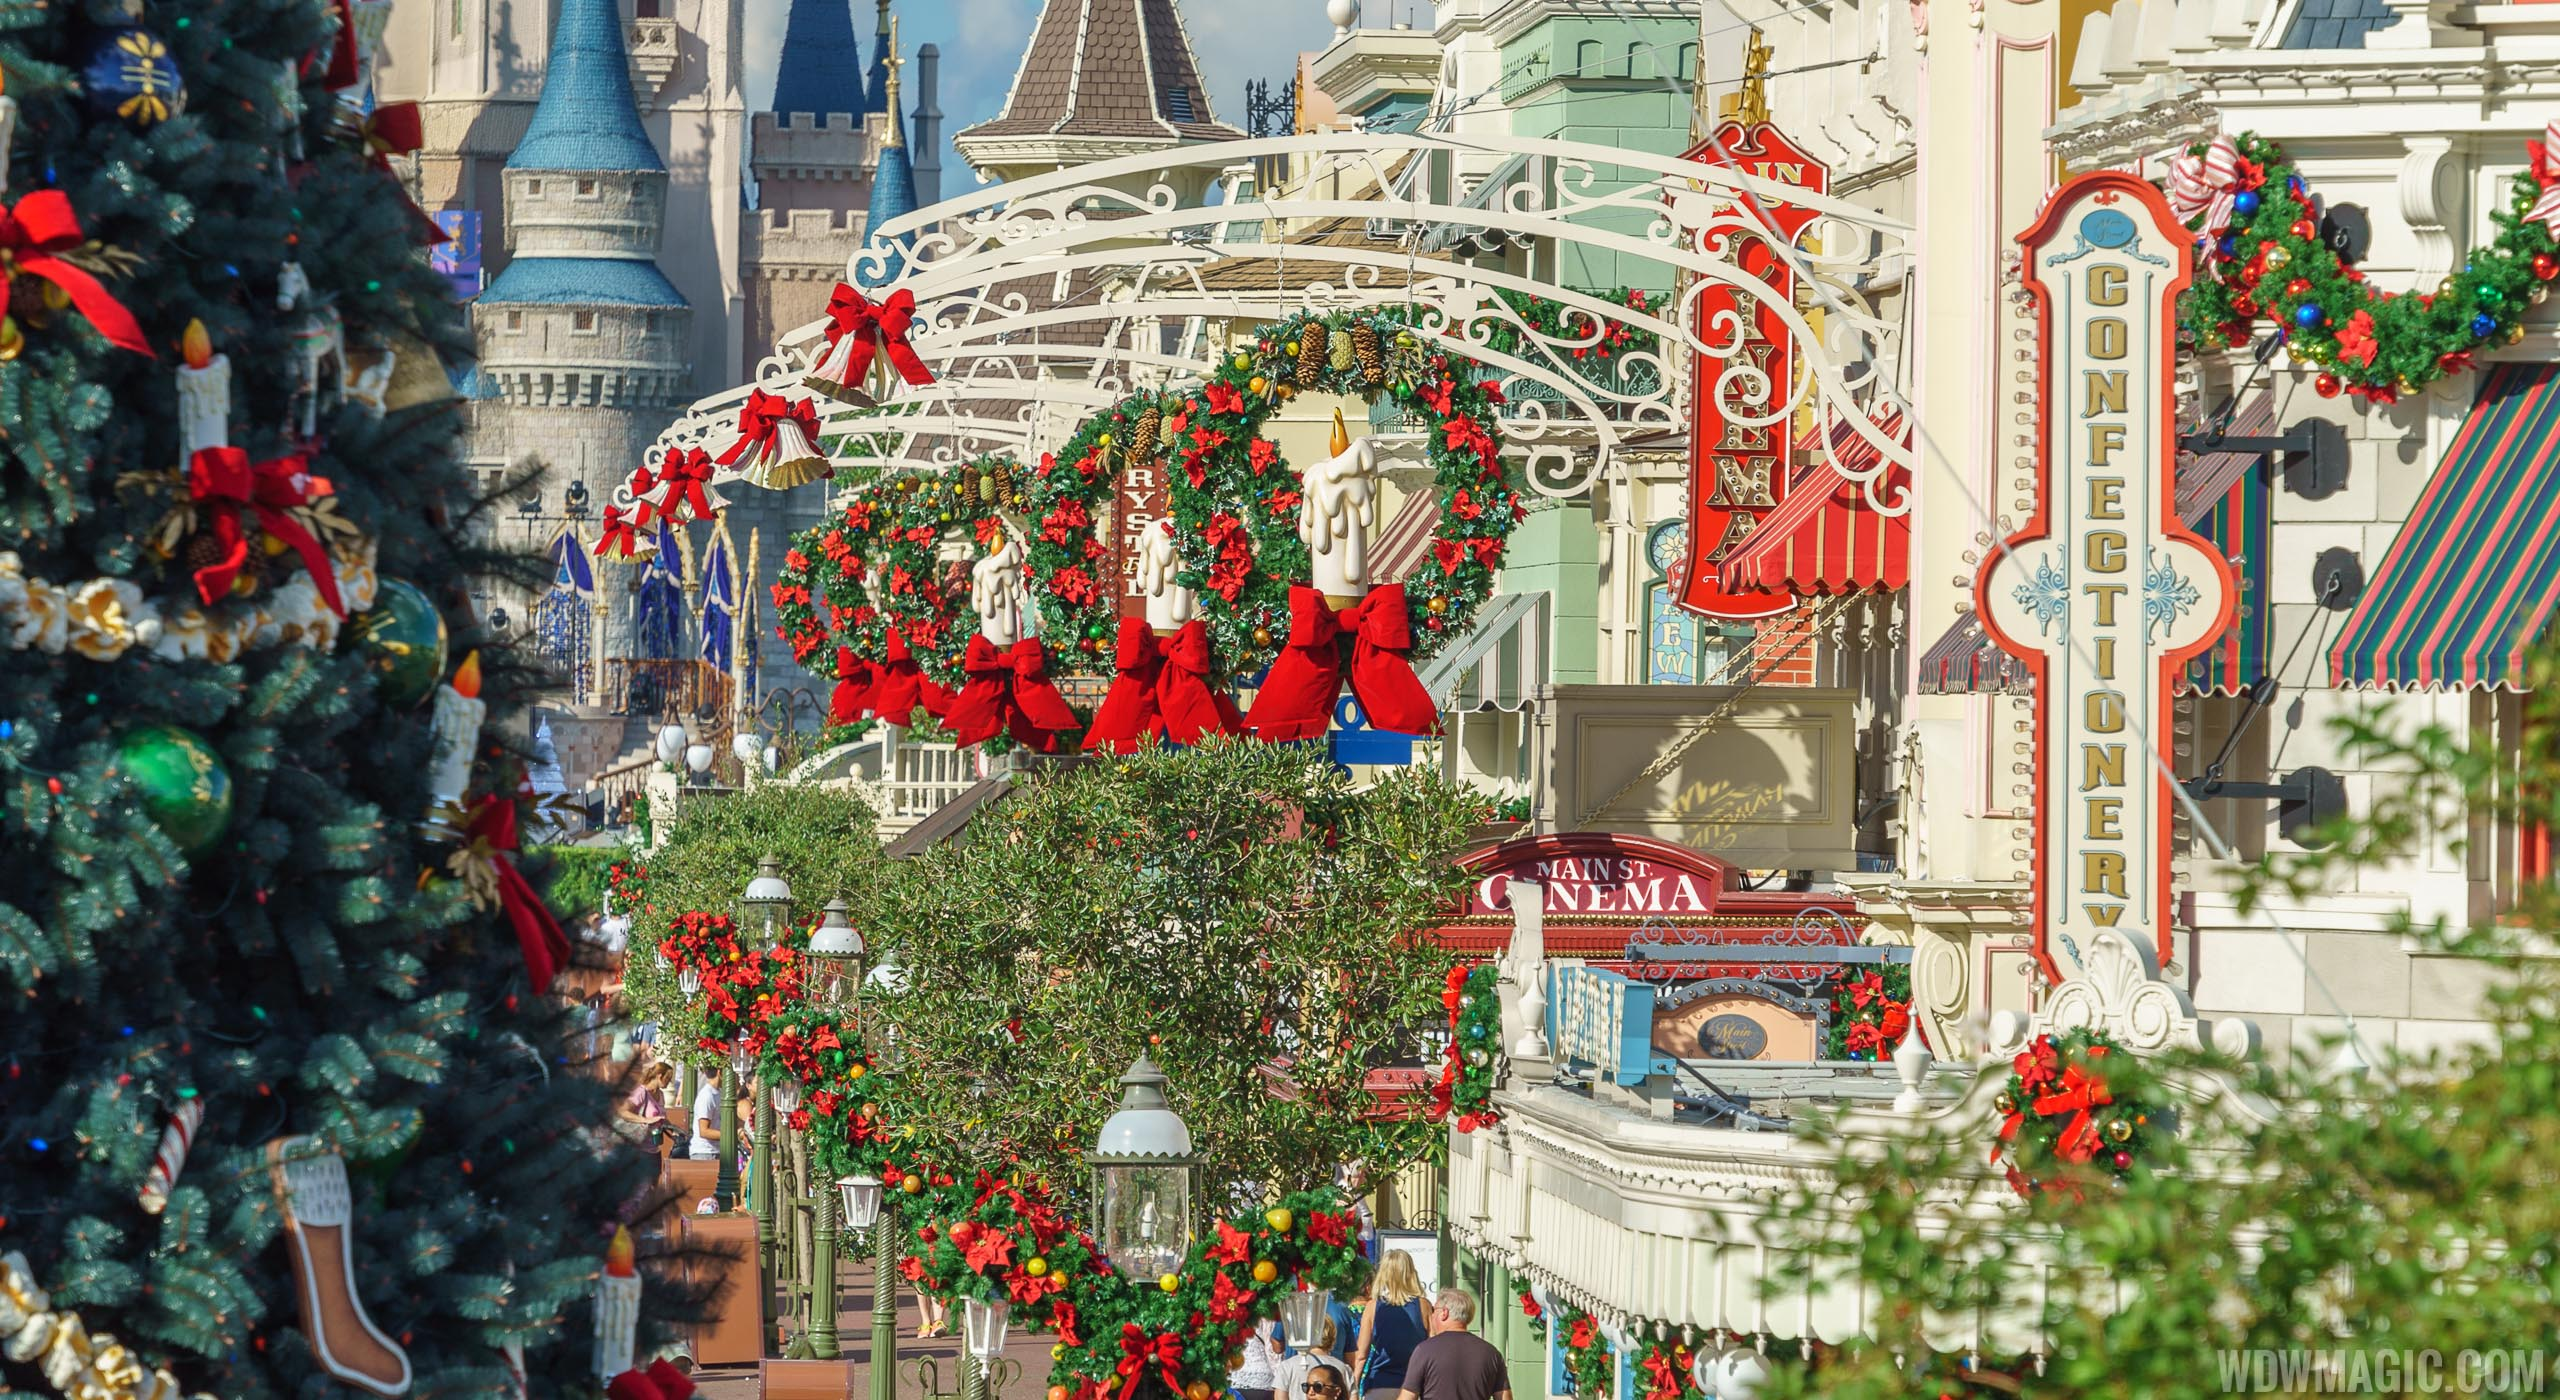 the magic kingdoms 2018 christmas holiday decor